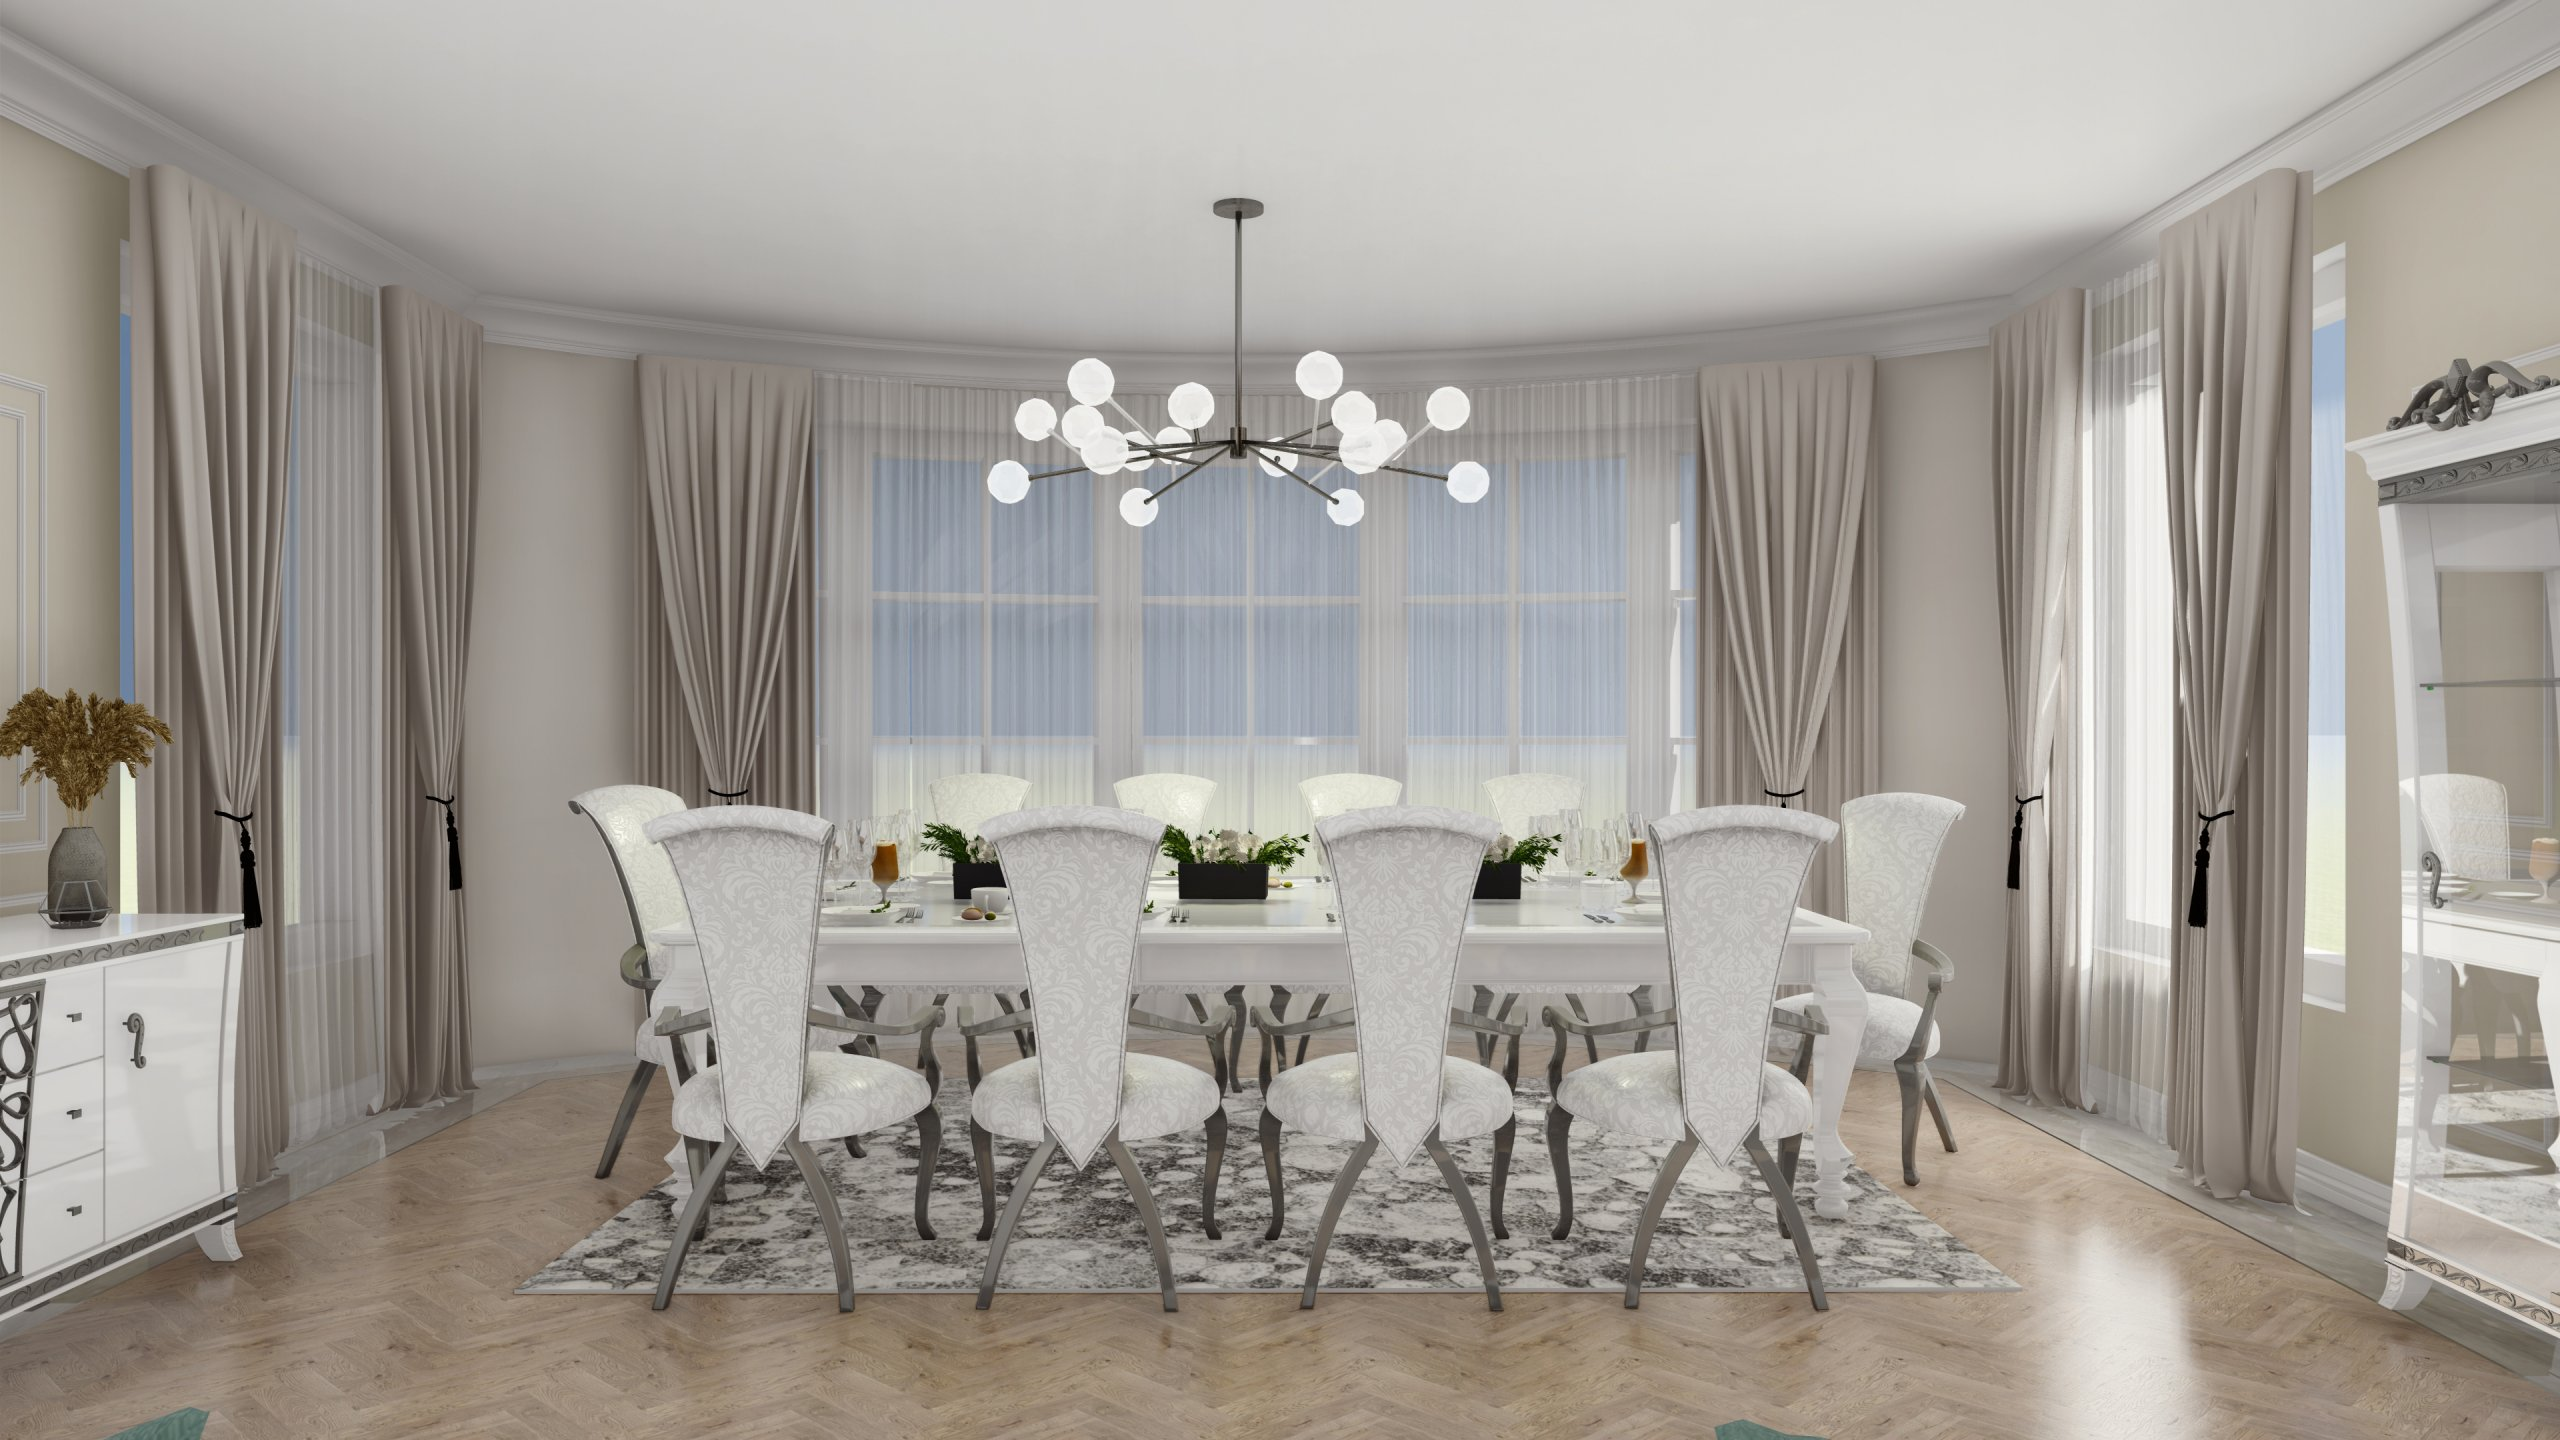 Sala dining amenajata in tonuri bej, alb si argintiu